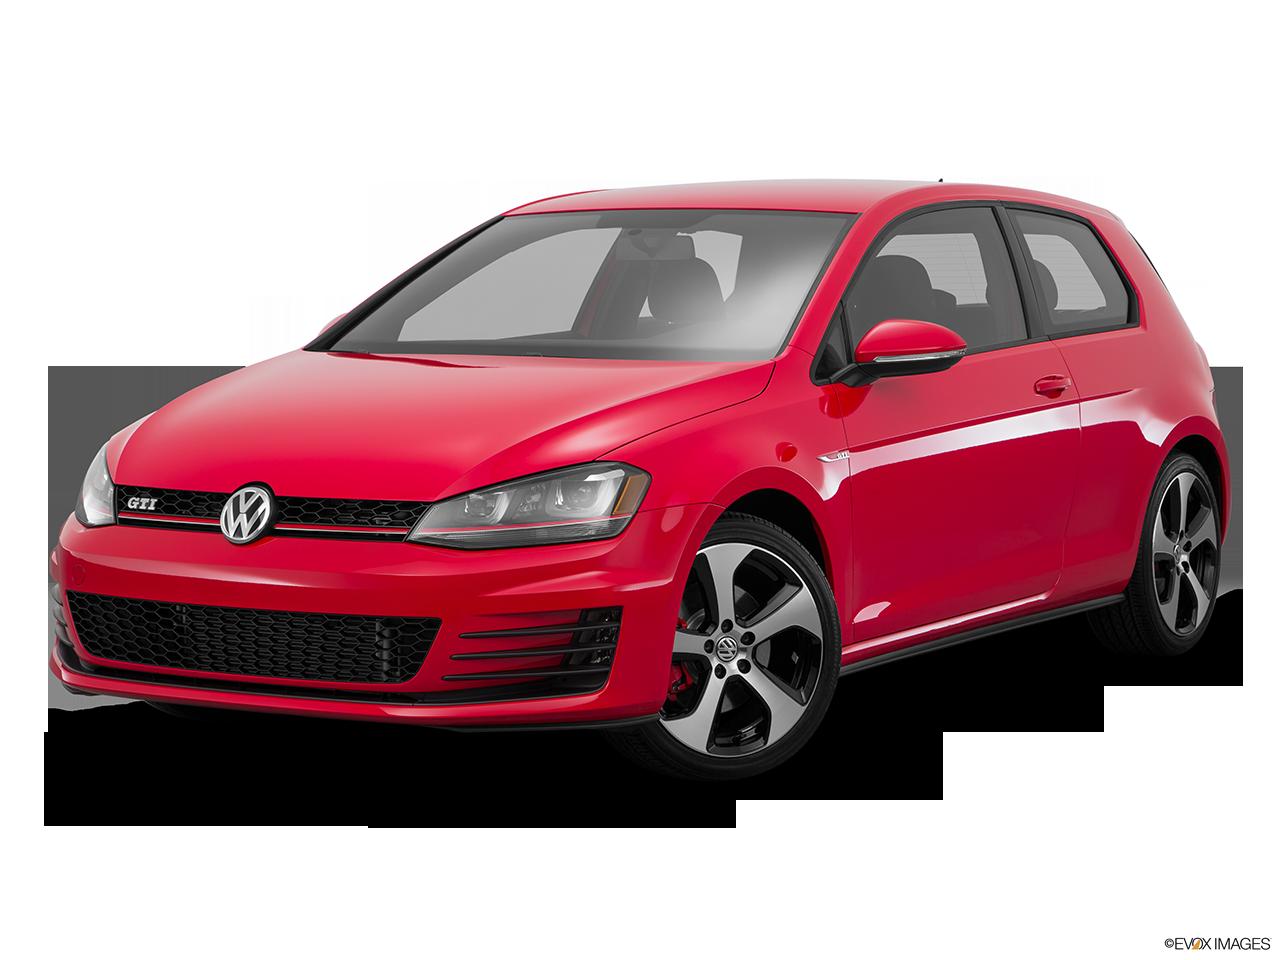 Test Drive A 2016 Volkswagen Golf GTI at Casey Volkswagen in Newport News